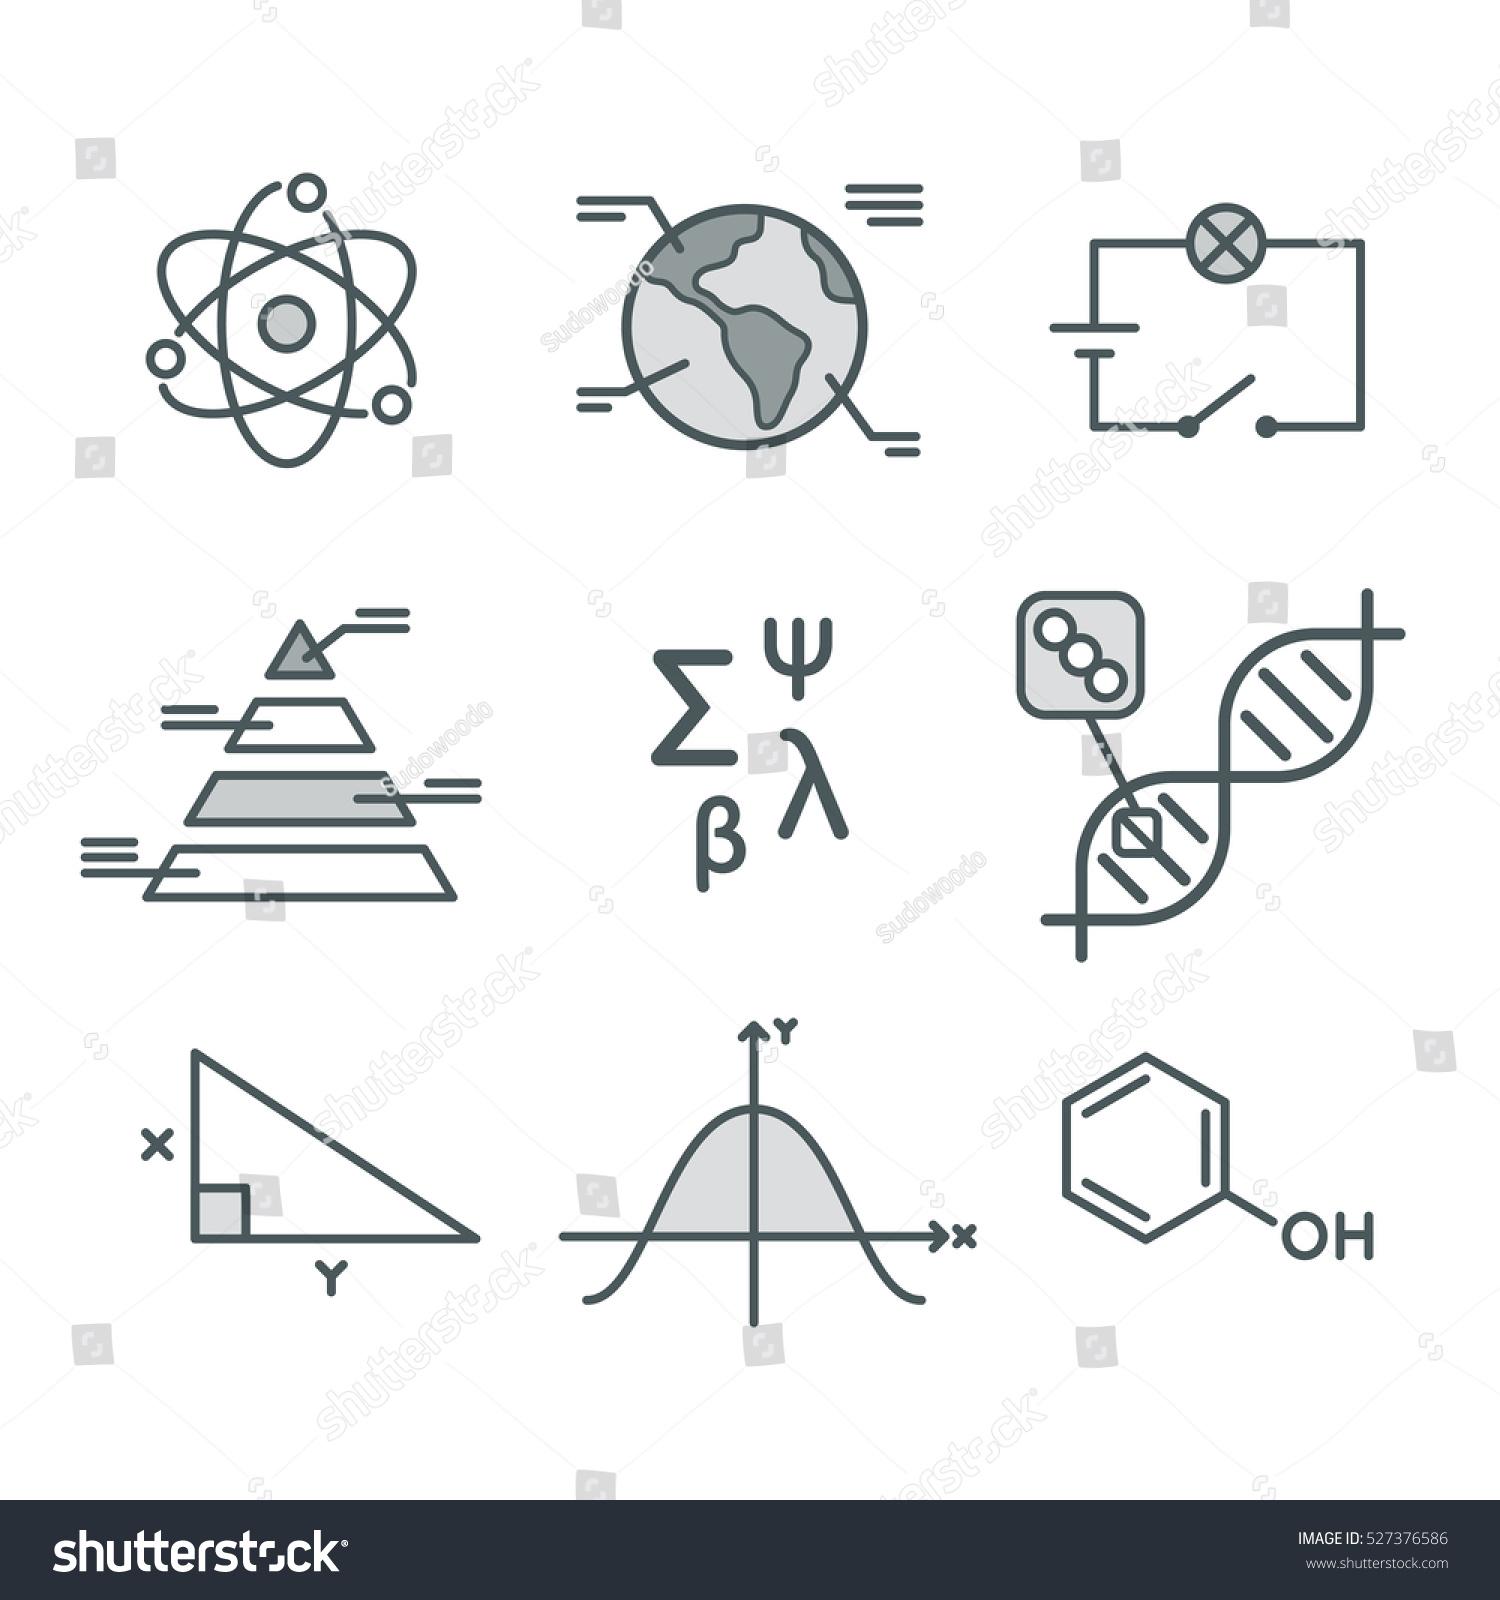 Science symbols set mathematical functions chemistry stock vector science symbols set mathematical functions chemistry and biology geography and physics abstract buycottarizona Images